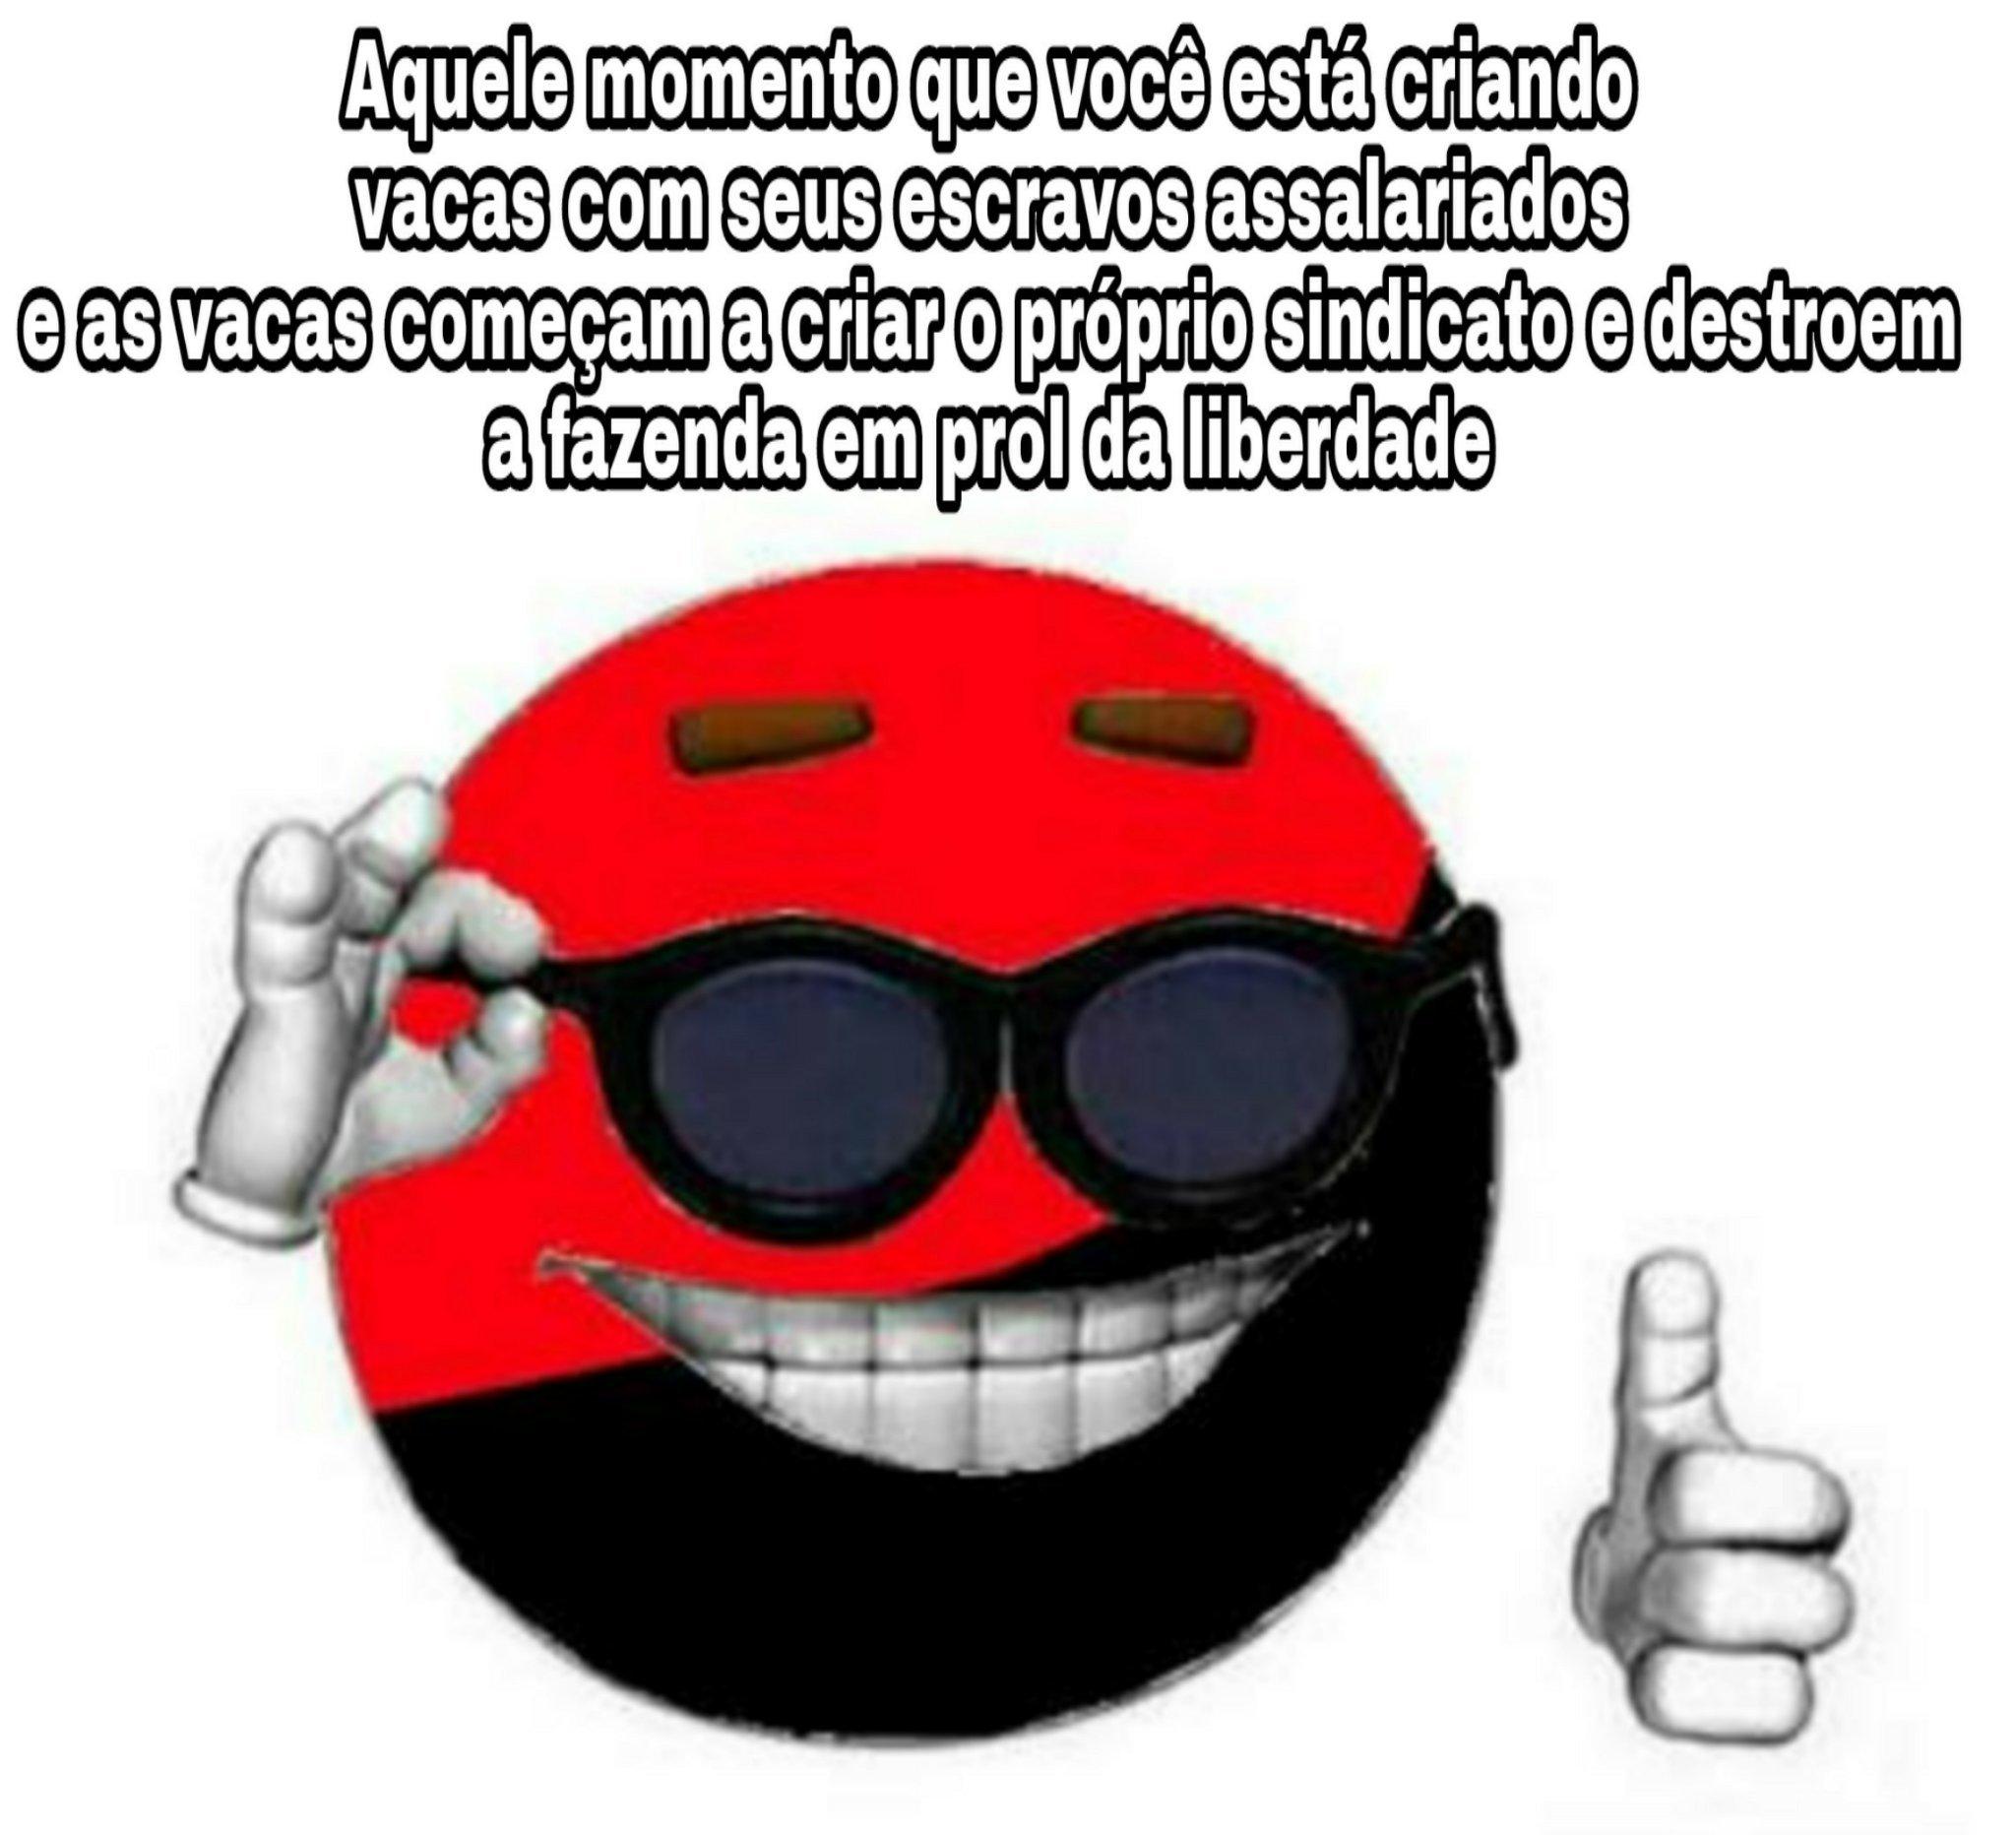 Anarco sindicalismo :ohgodwhy: - meme